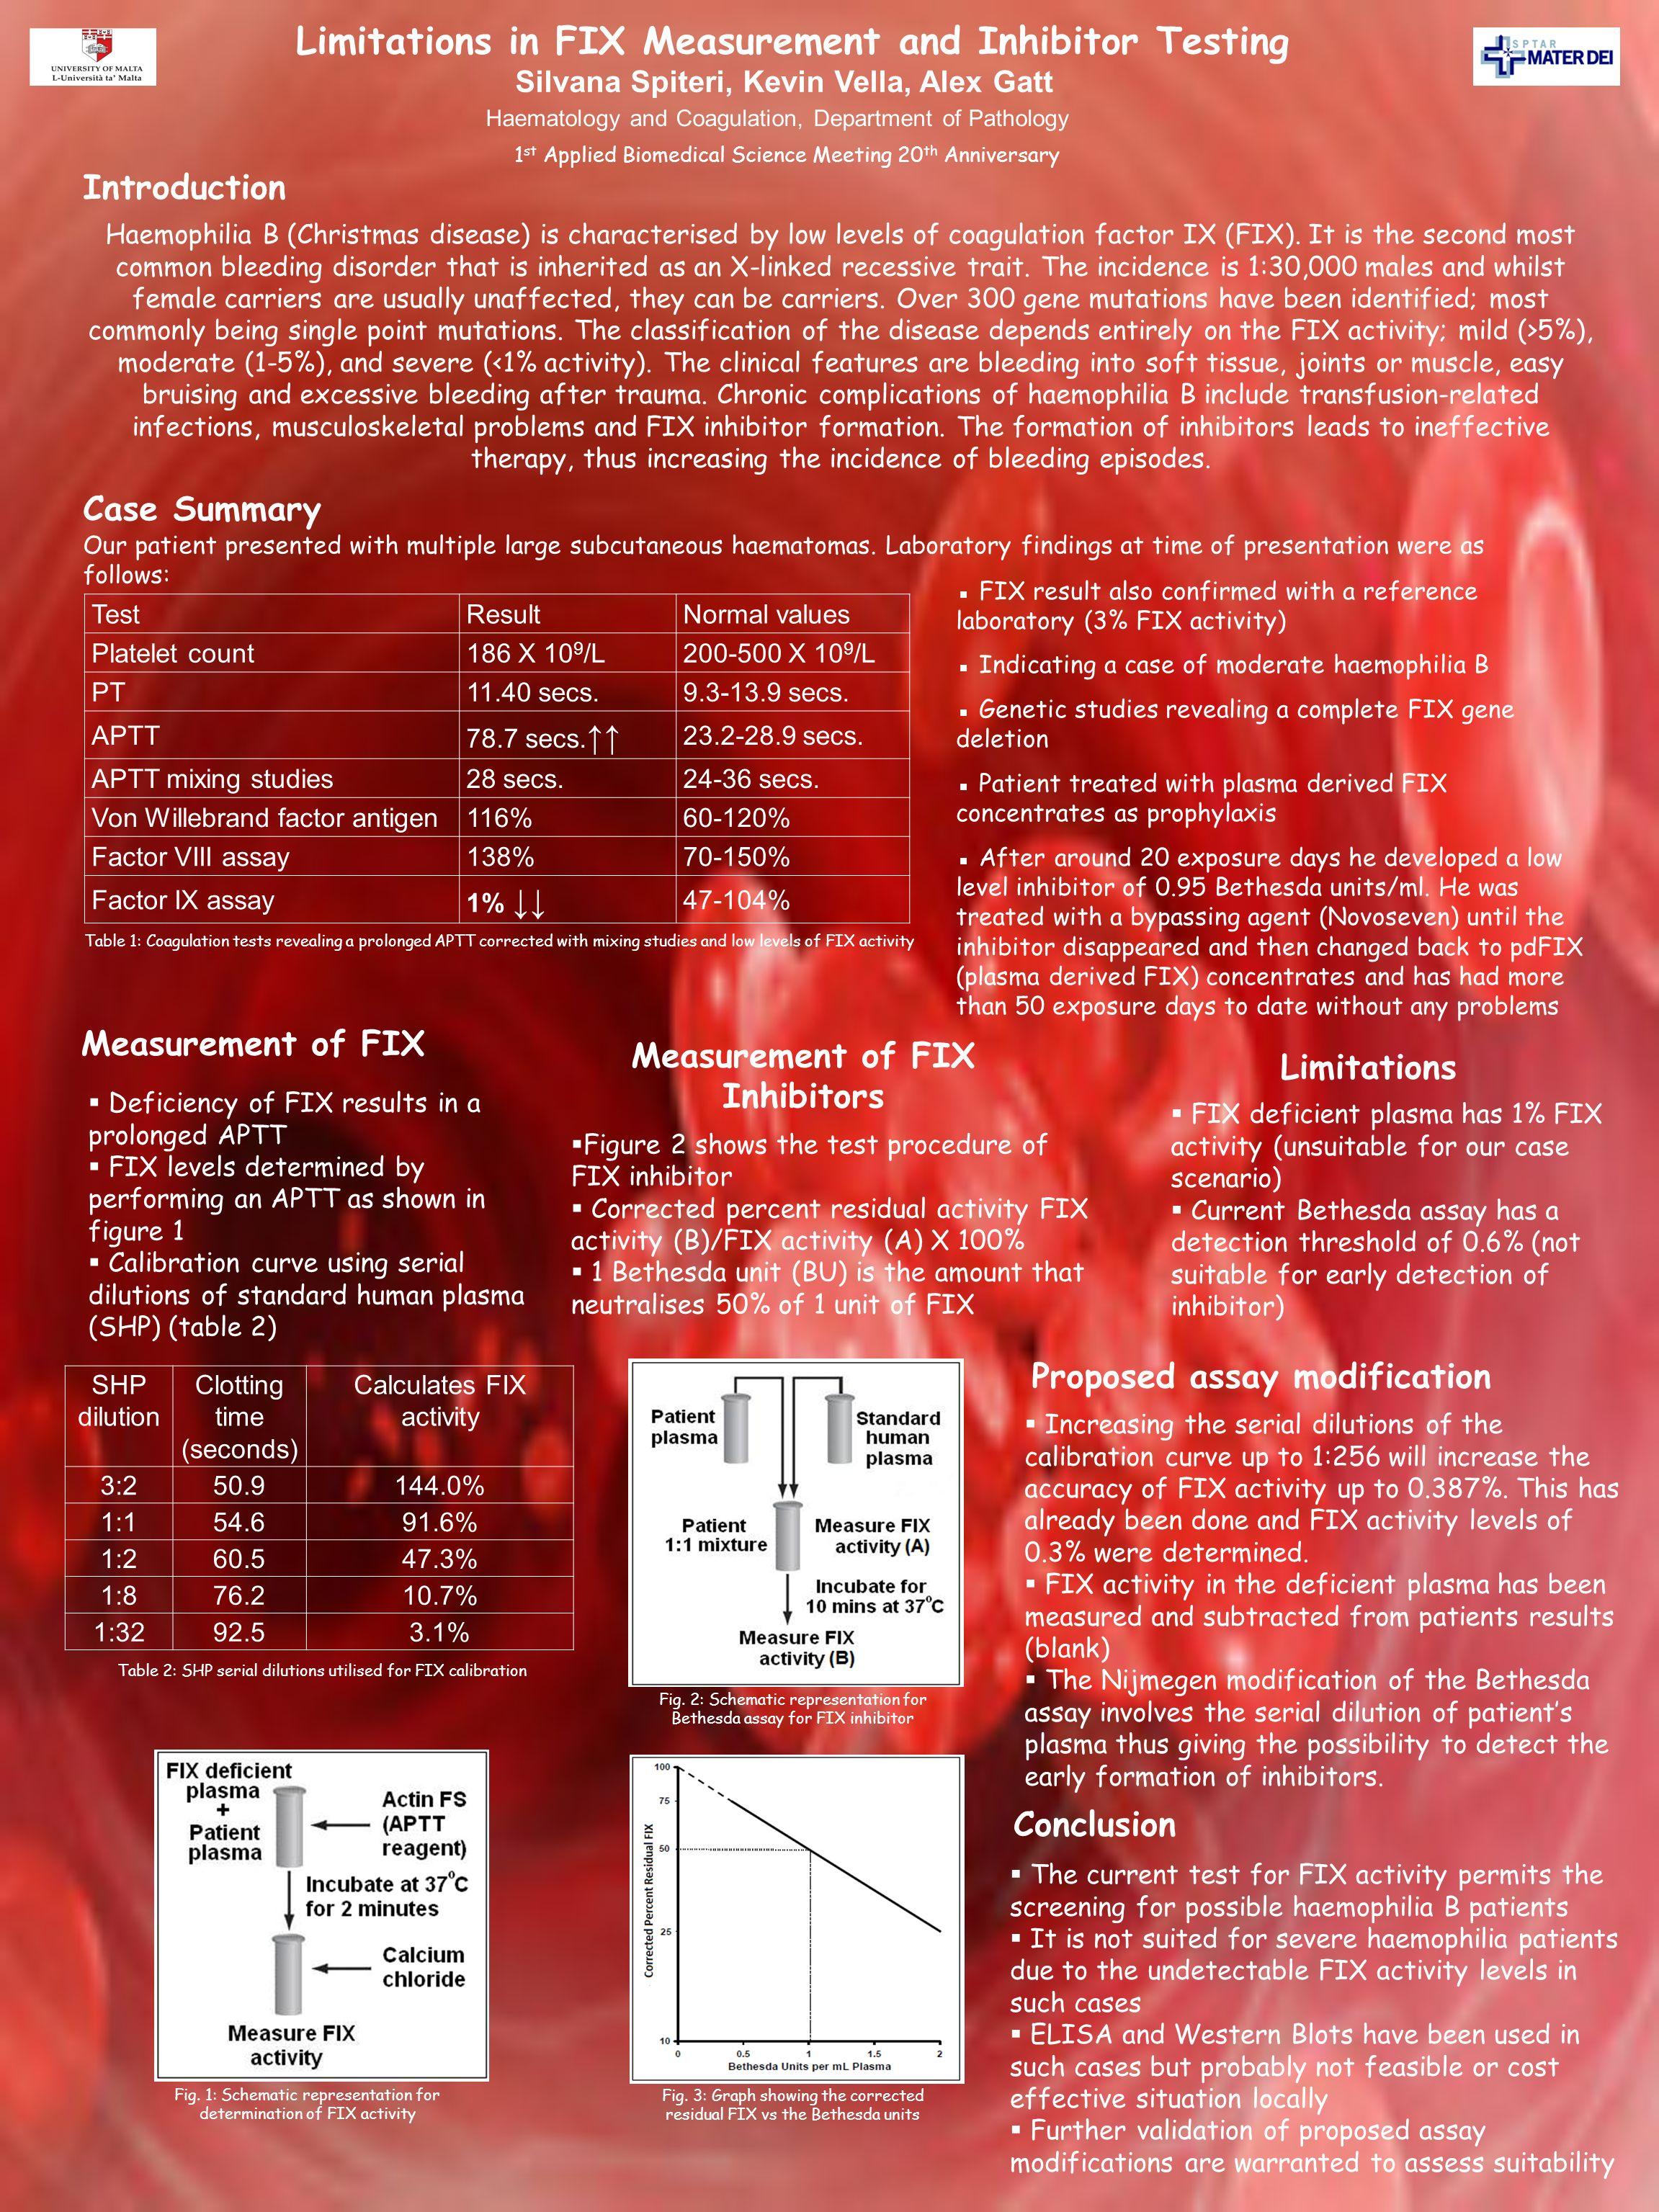 Limitations in FIX Measurement and Inhibitor Testing Silvana Spiteri, Kevin Vella, Alex Gatt Introduction Haemophilia B (Christmas disease) is characterised by low levels of coagulation factor IX (FIX).